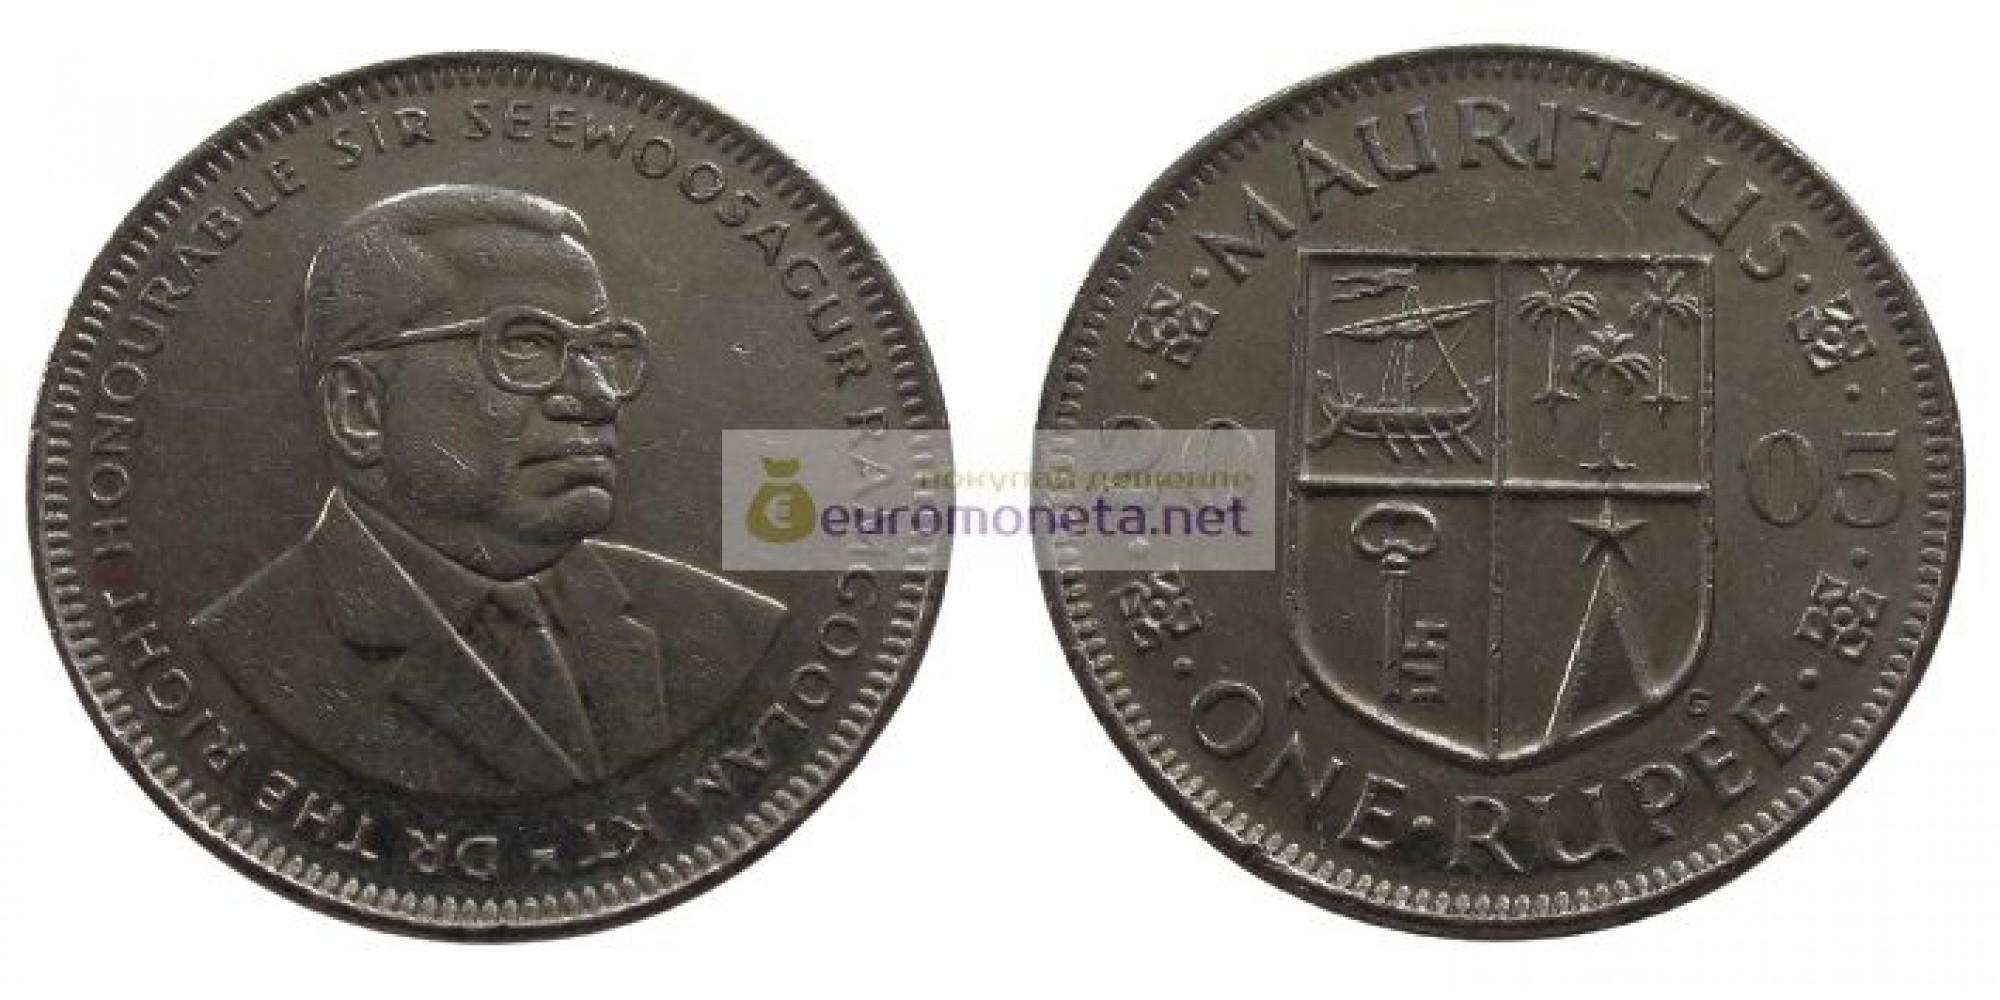 Маврикий 1 рупия 2005 год. Сивусагур Рамгулам